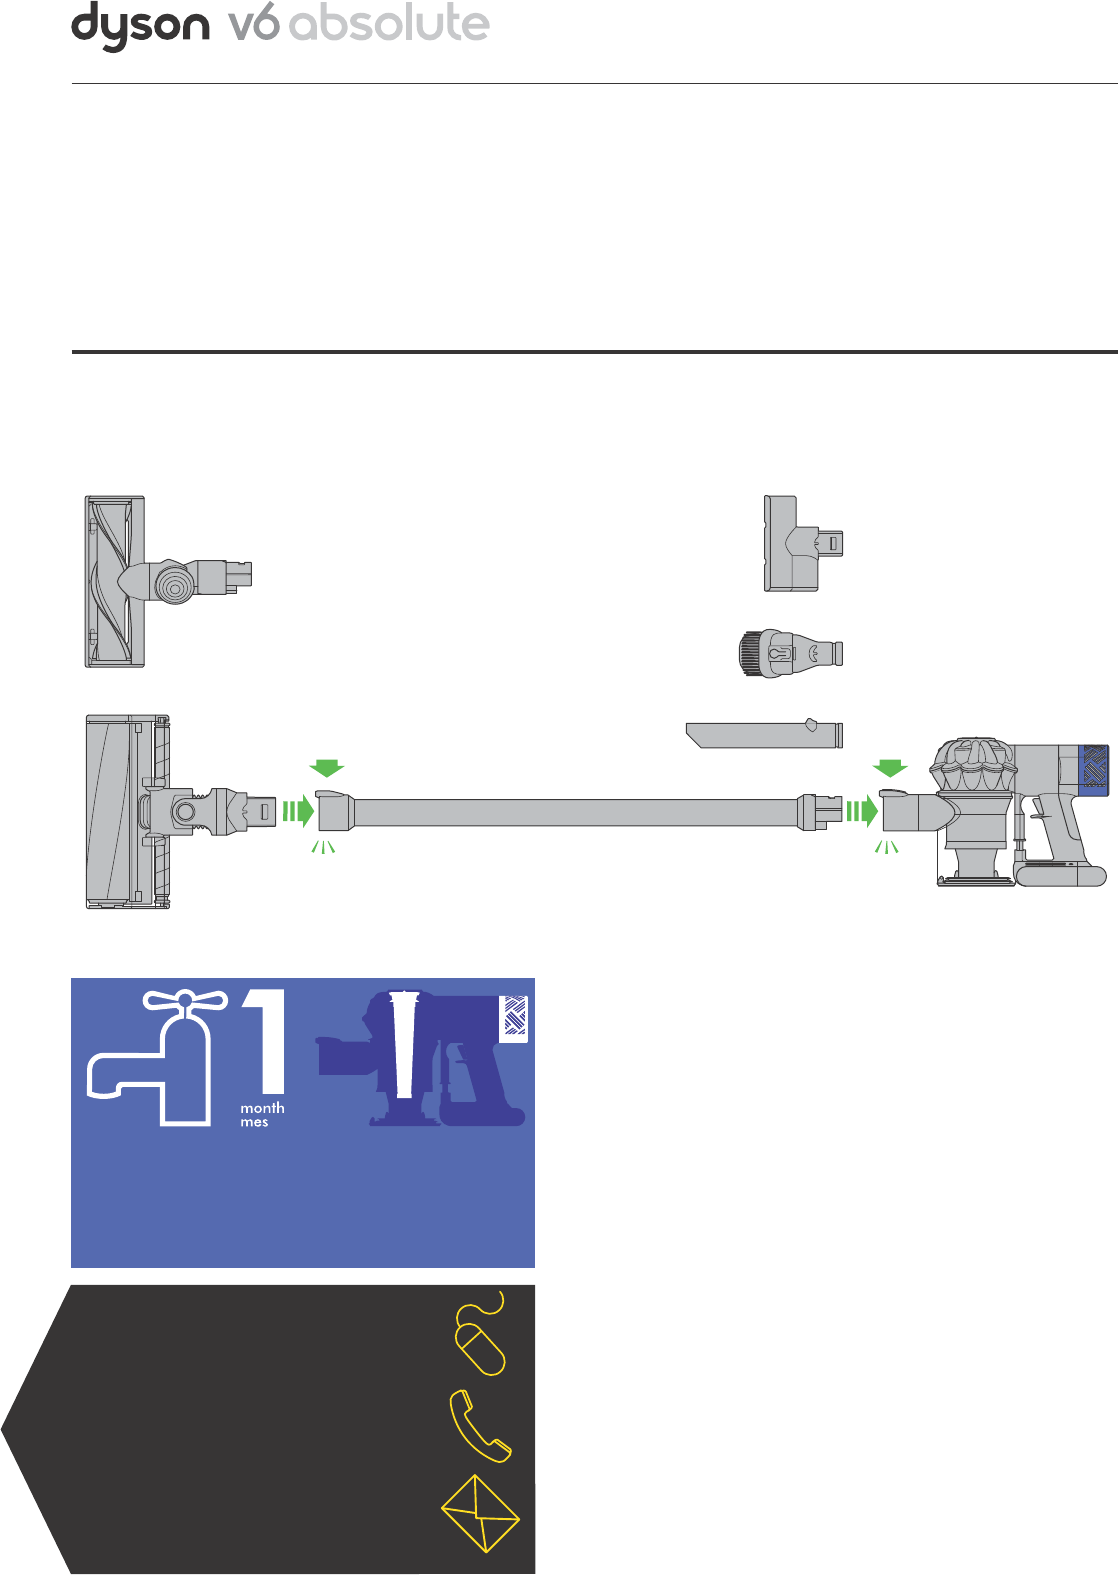 Dyson v6 absolute инструкция во miles dyson